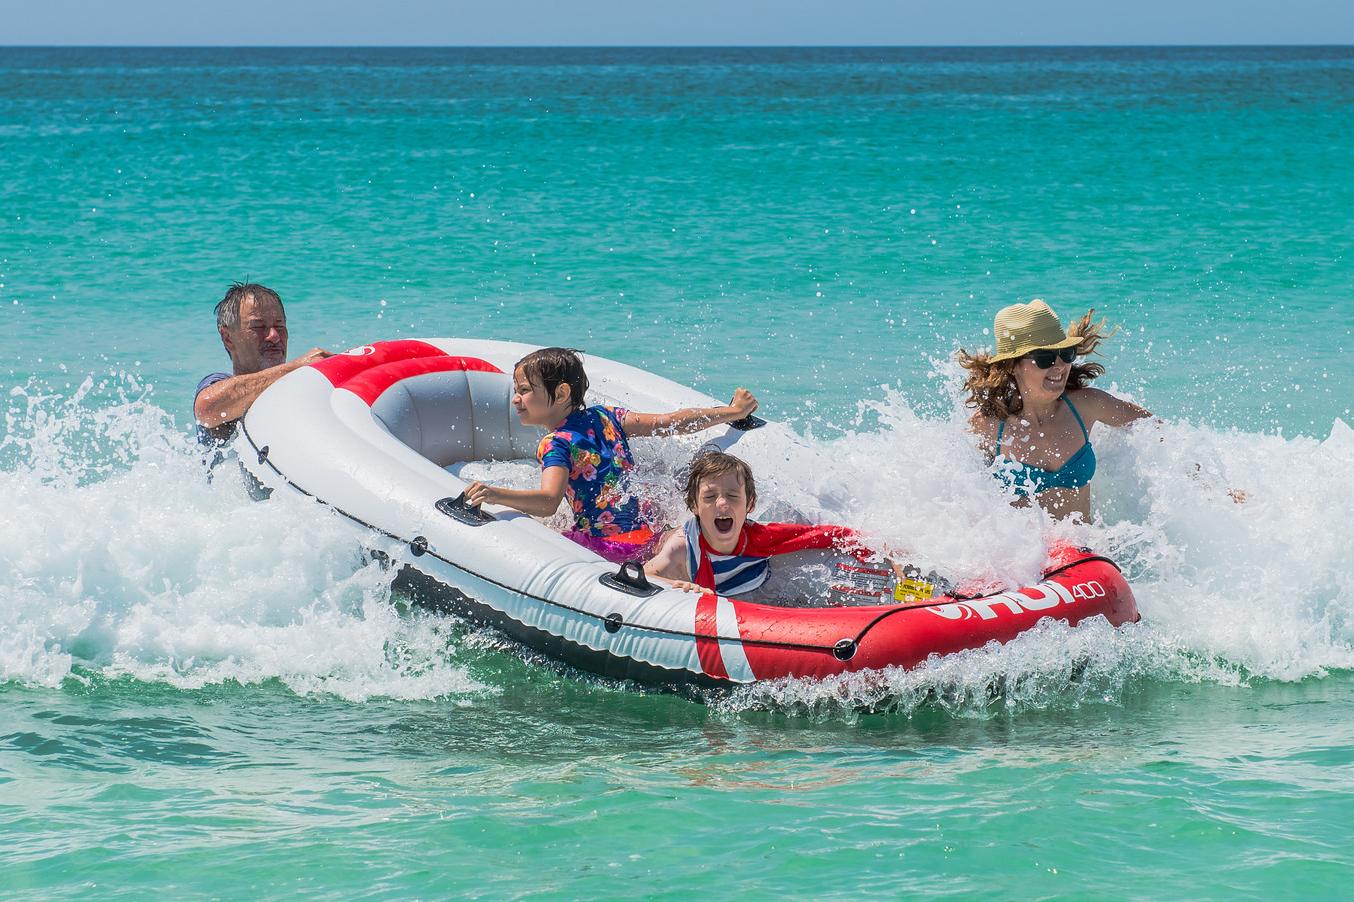 web-holidays-family-fun-boat-sea-matt-deavenport-cc